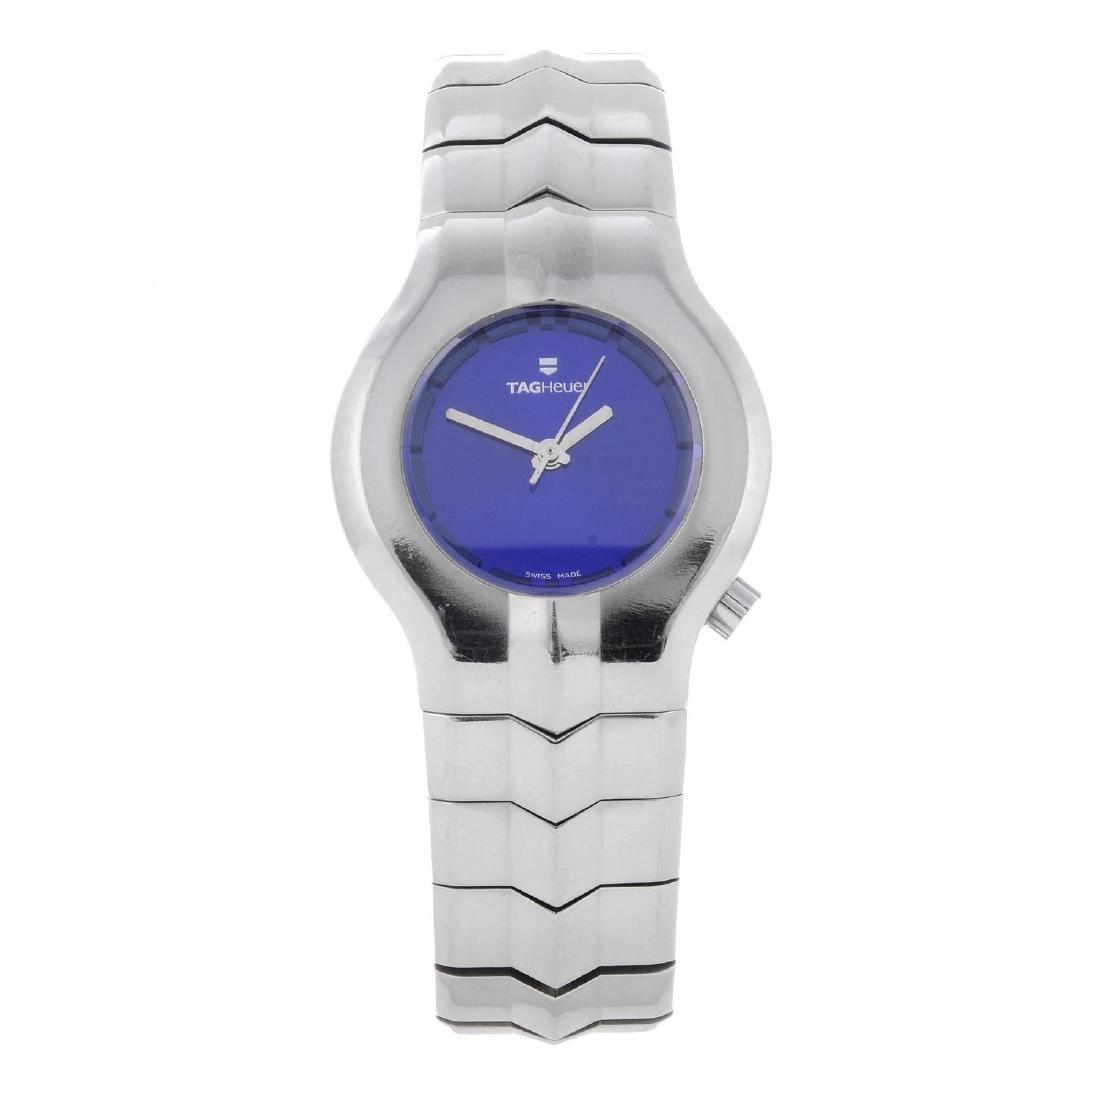 TAG HEUER - a lady's Alter Ego bracelet watch.